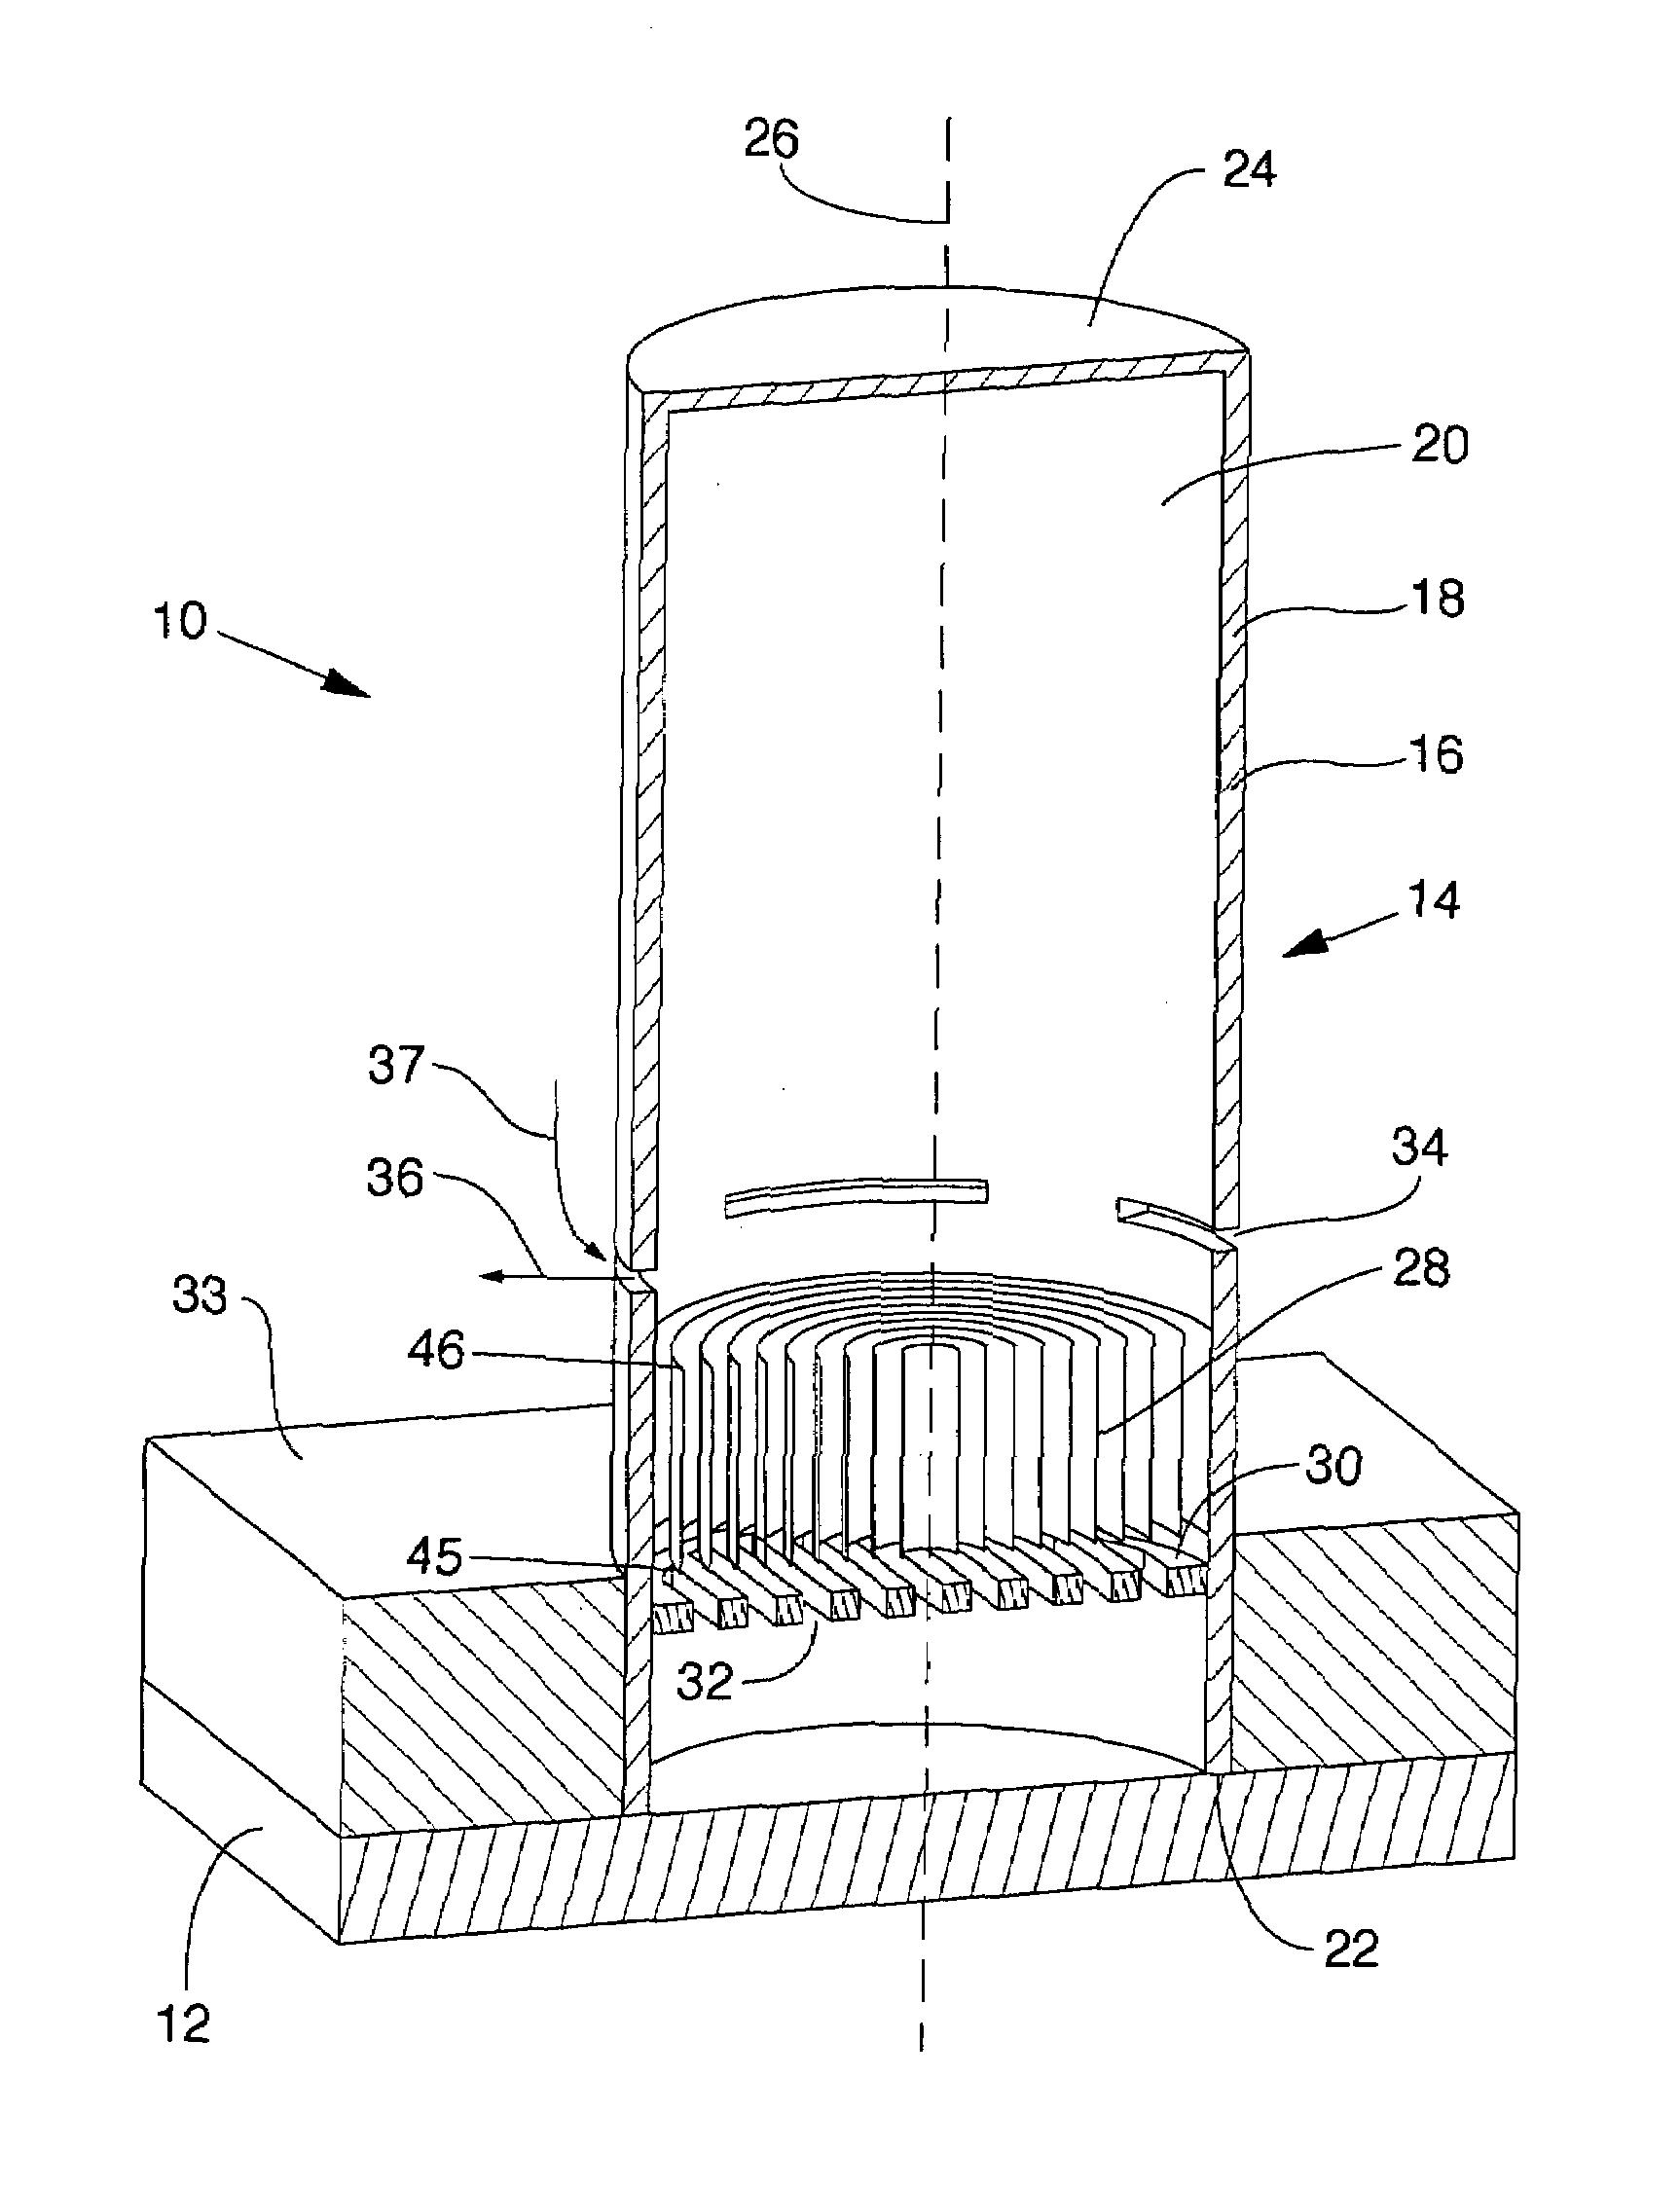 Heat Engine: Heat Engine No Moving Parts